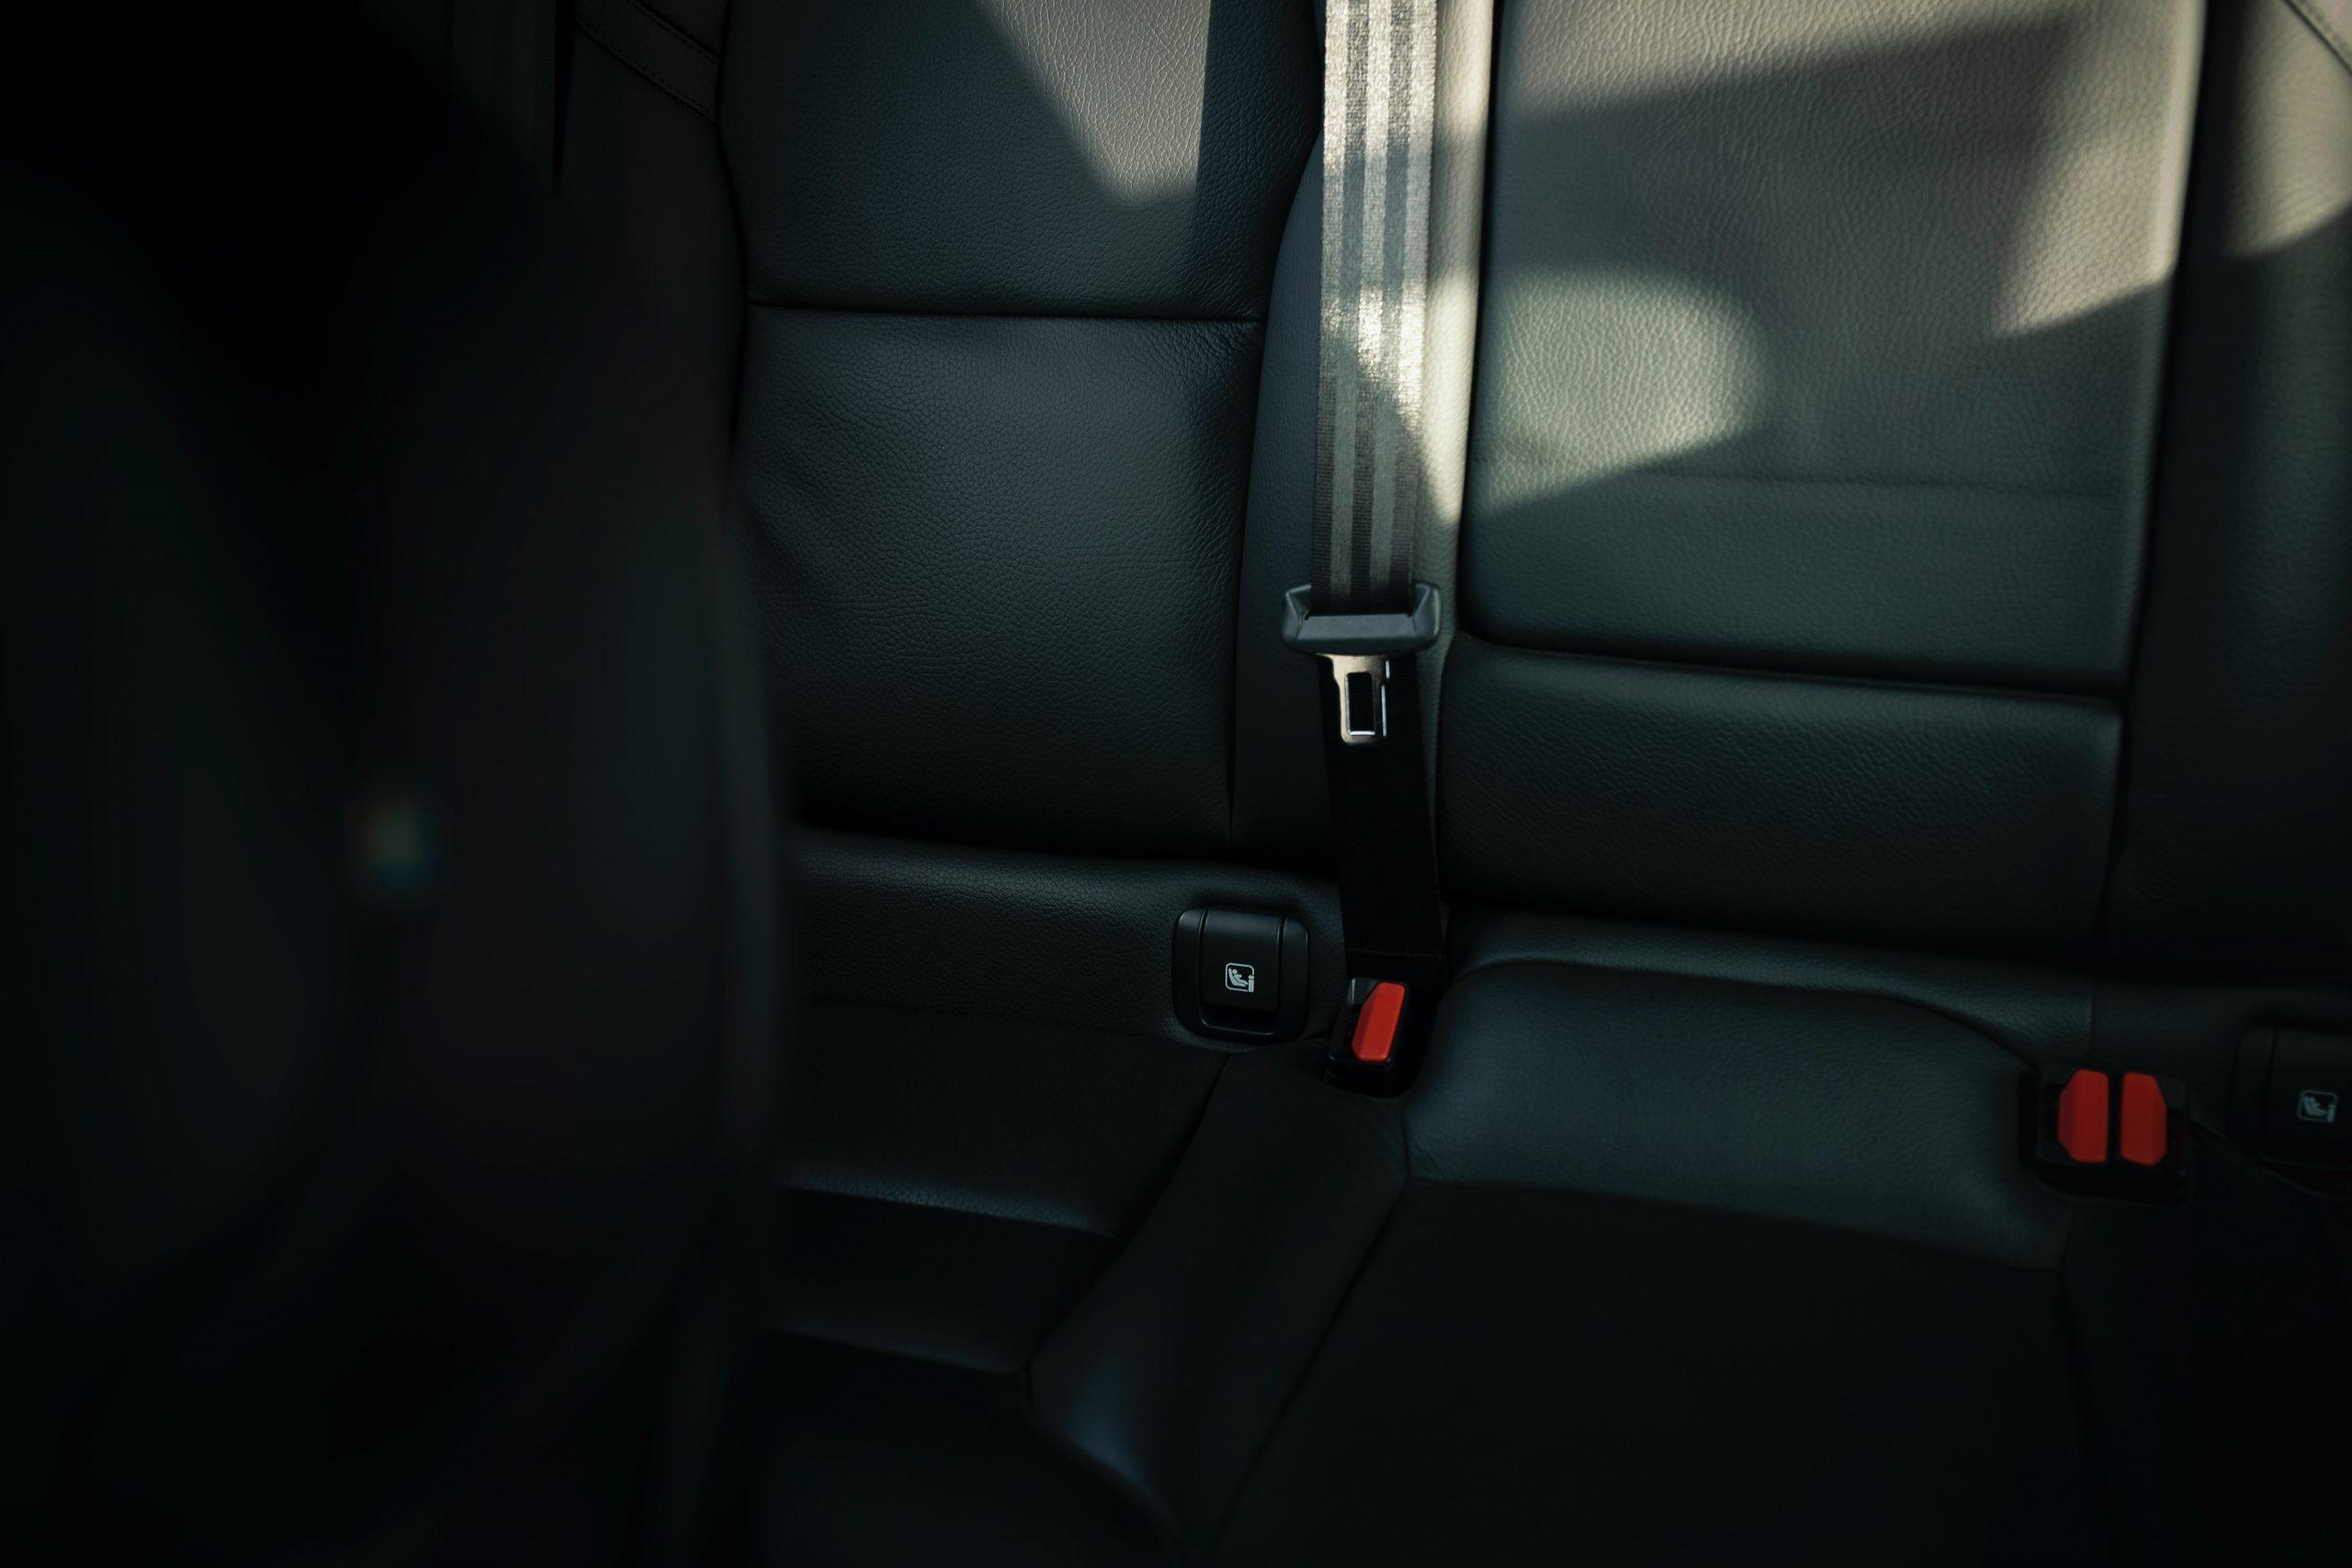 Stucked seatbelt